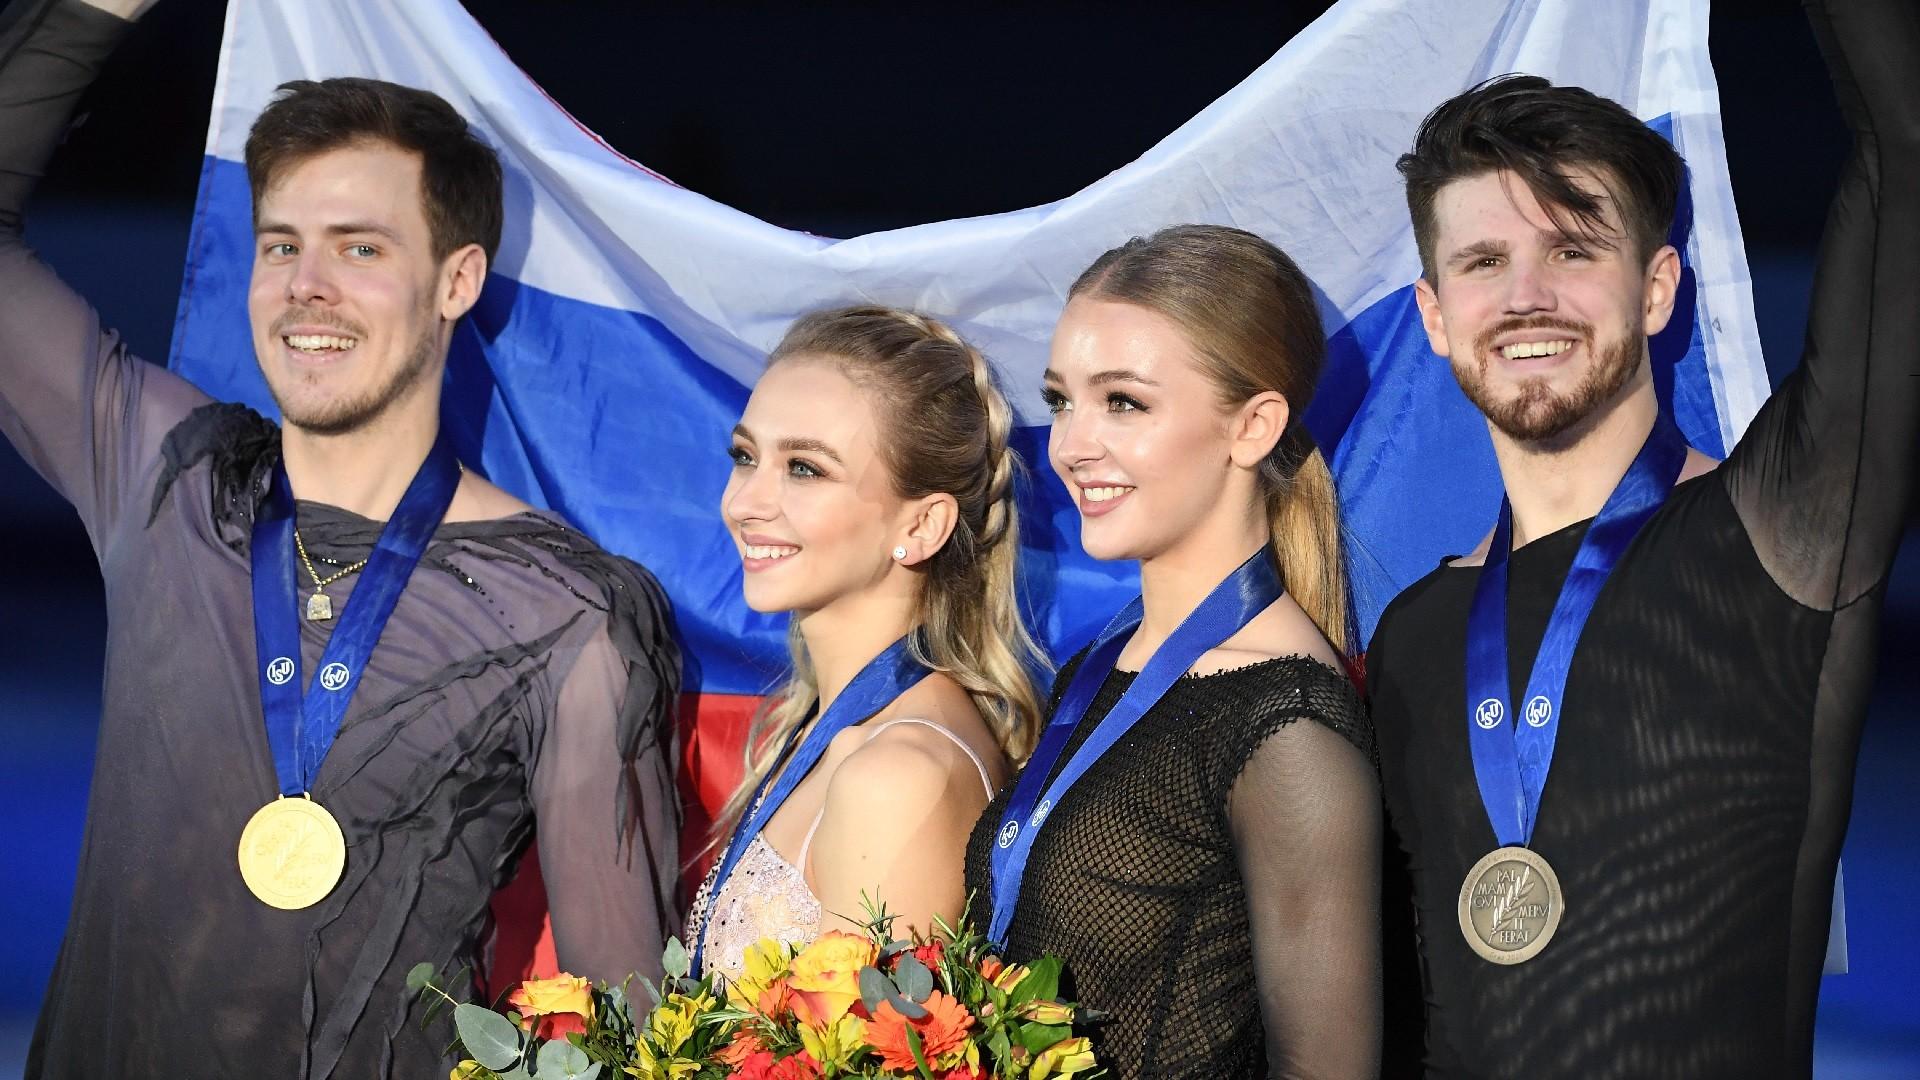 Les patineurs russes Victoria Sinitsina, Nikita Katsalapov, Alexandra Stepanova et Ivan Bukin